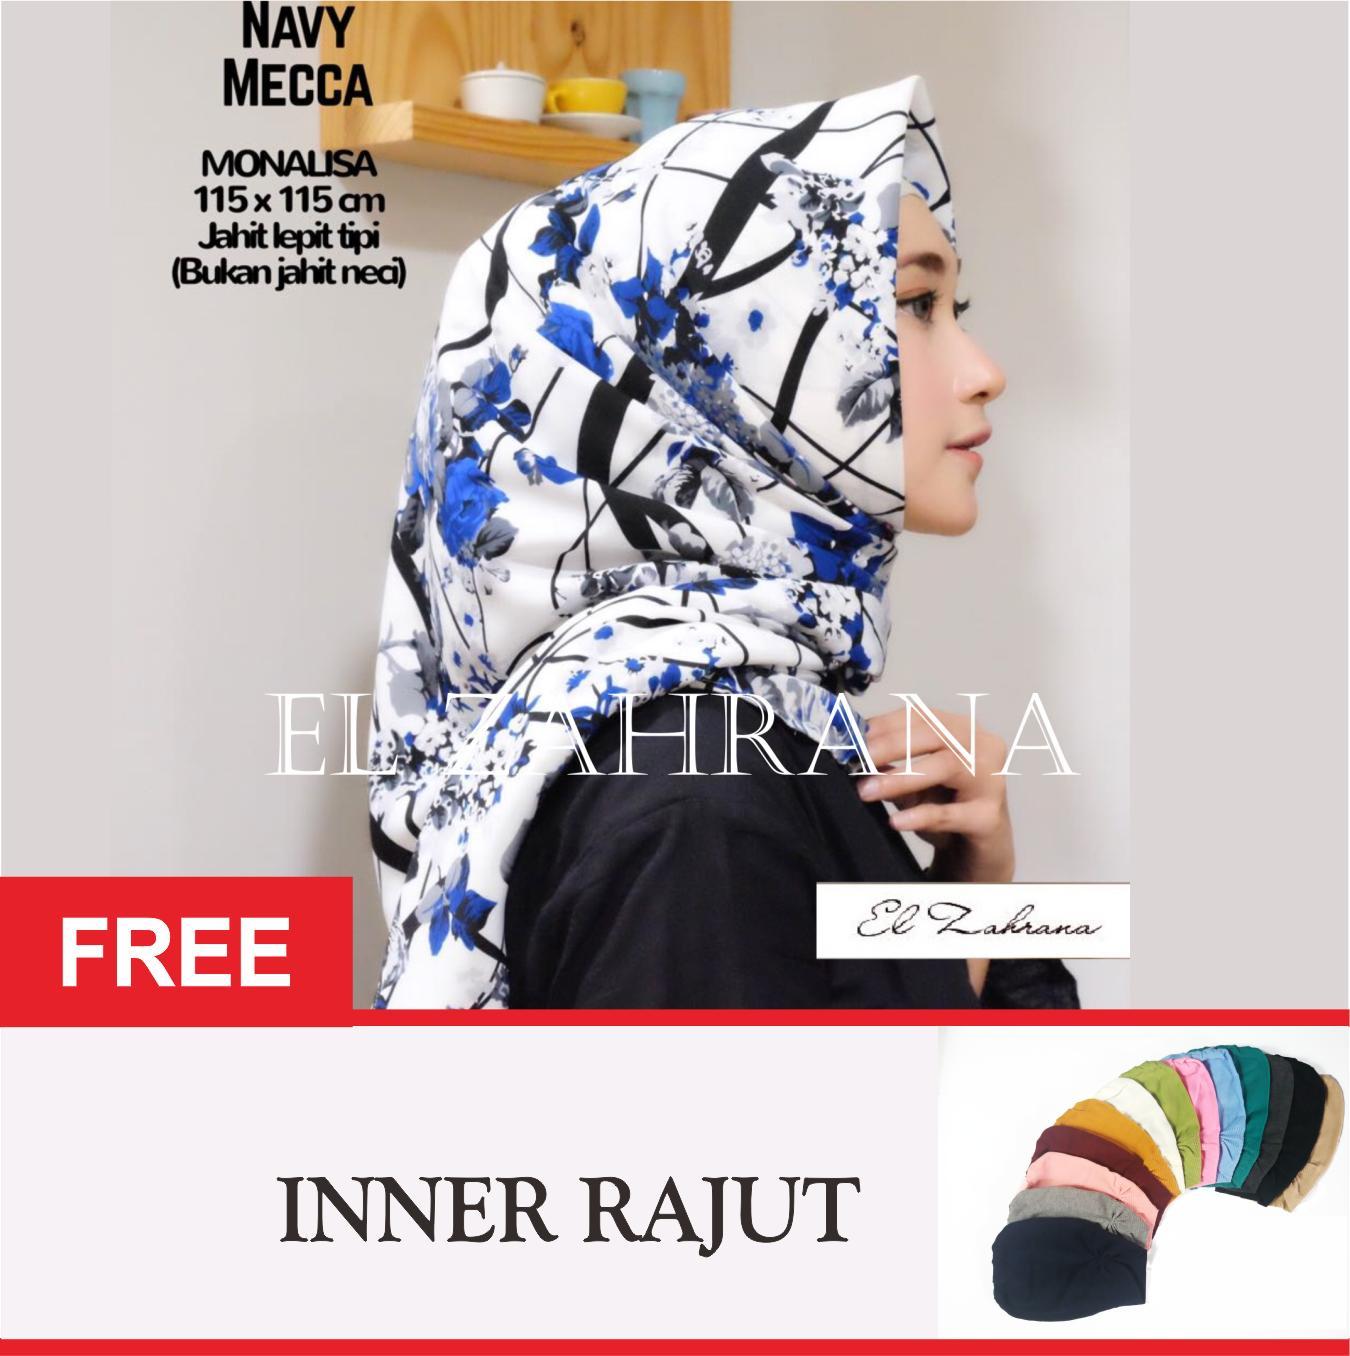 El Zahrana Kerudung Segi Empat - Jilbab Segi Empat - Jilbab Motif Monalisa - Monalisa Diorr - Premium Silk